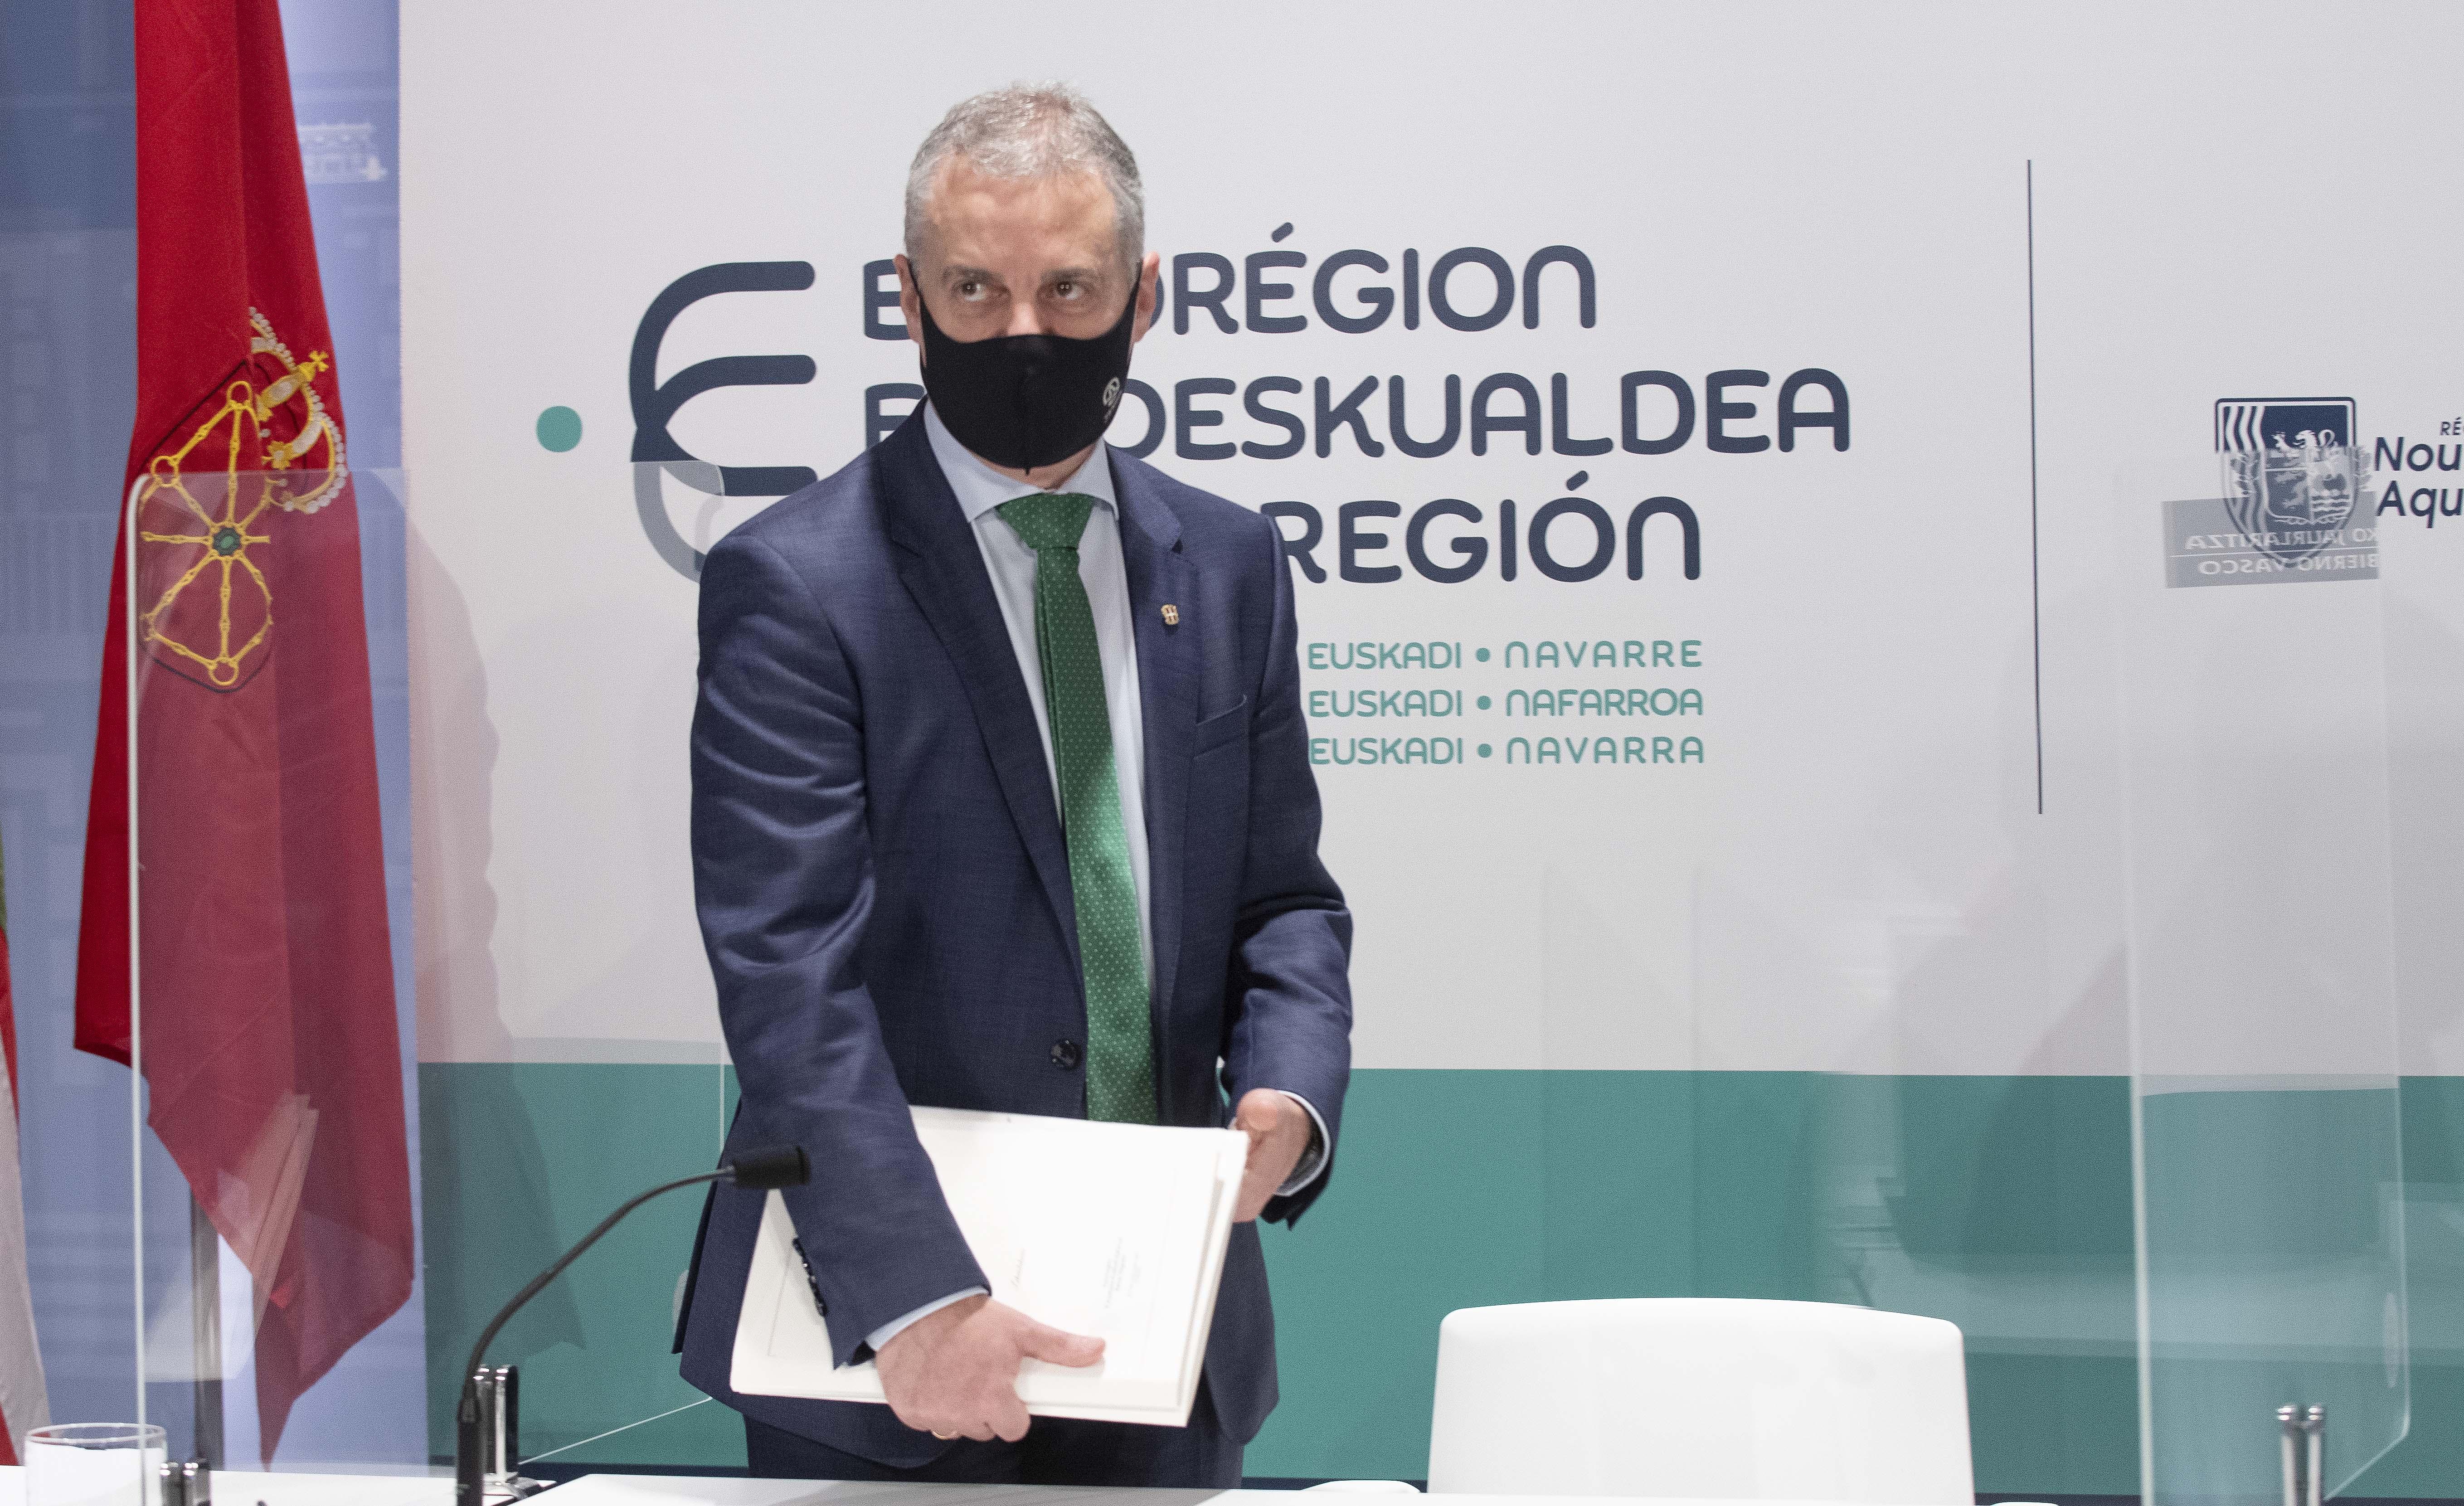 2021_03_16_lhk_eurorregion.jpg